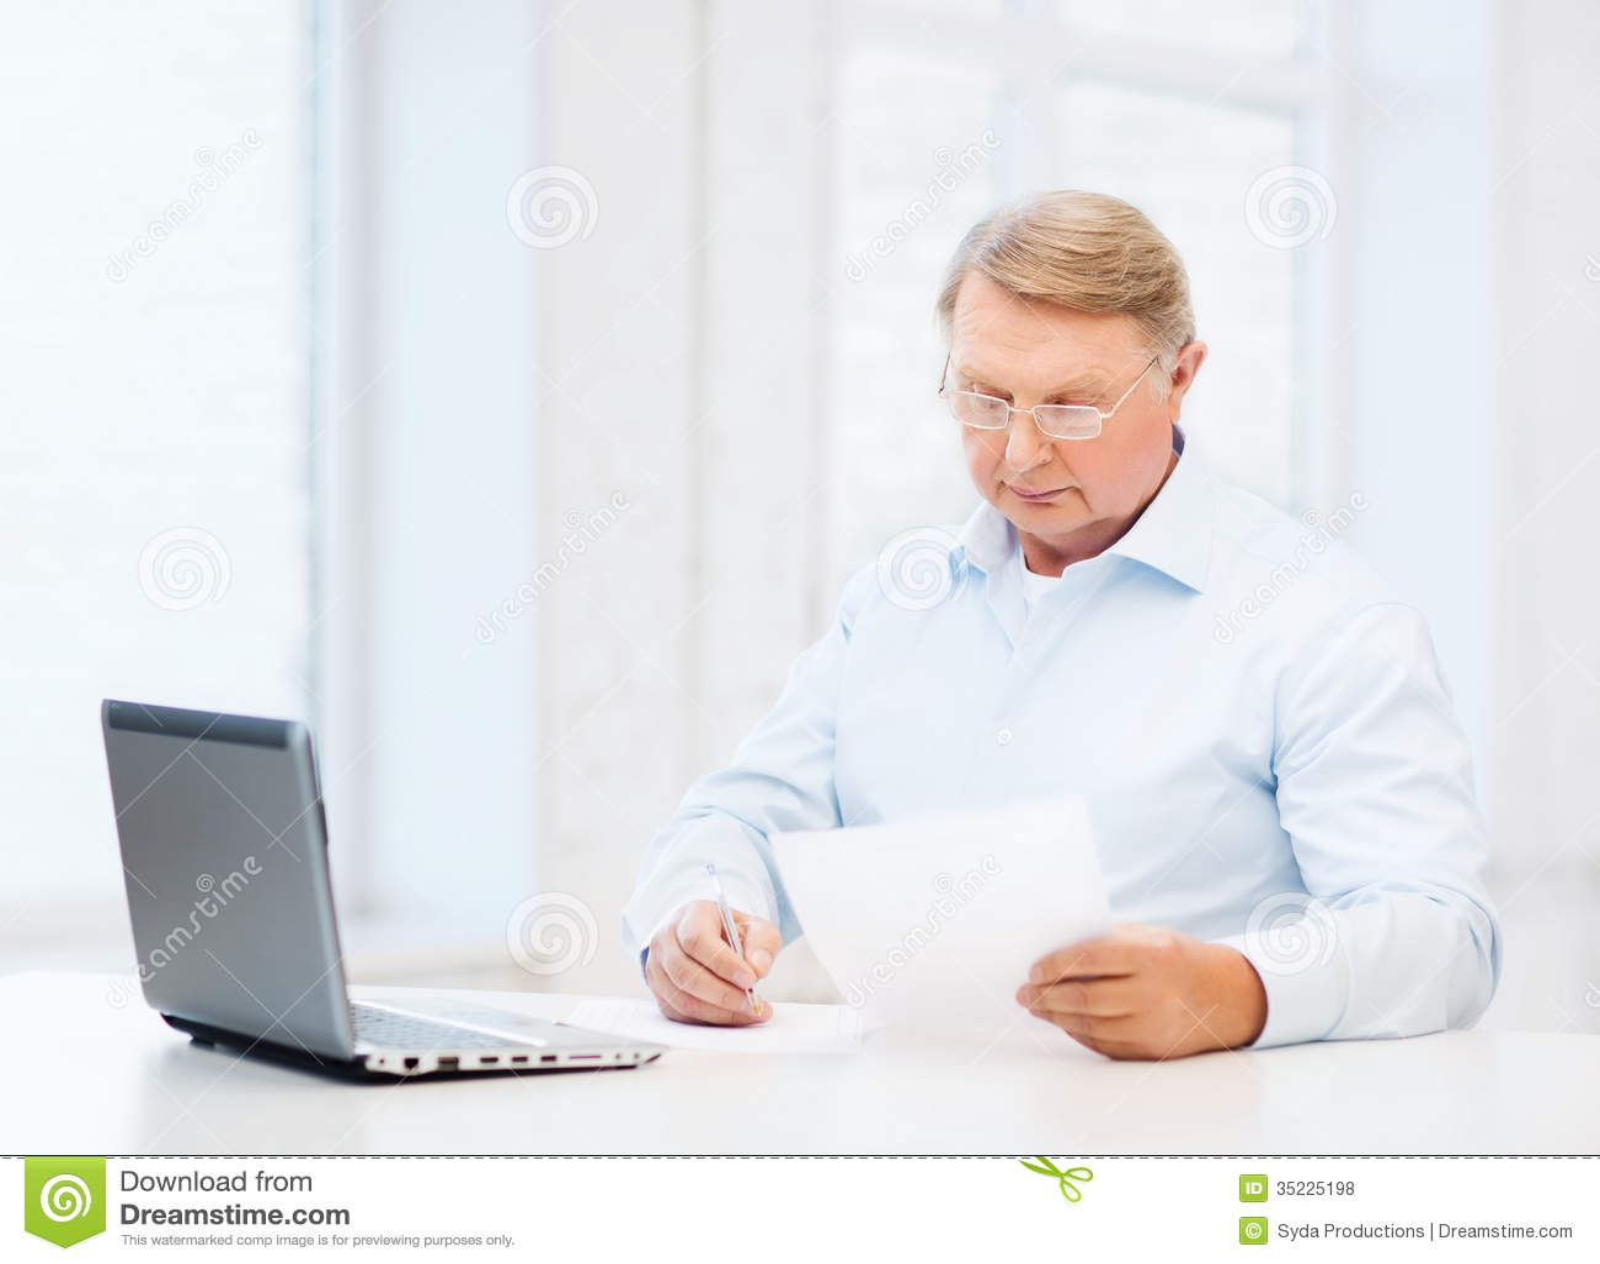 old man in eyeglasses filling a form at home royalty free stock photos image 35225198. Black Bedroom Furniture Sets. Home Design Ideas